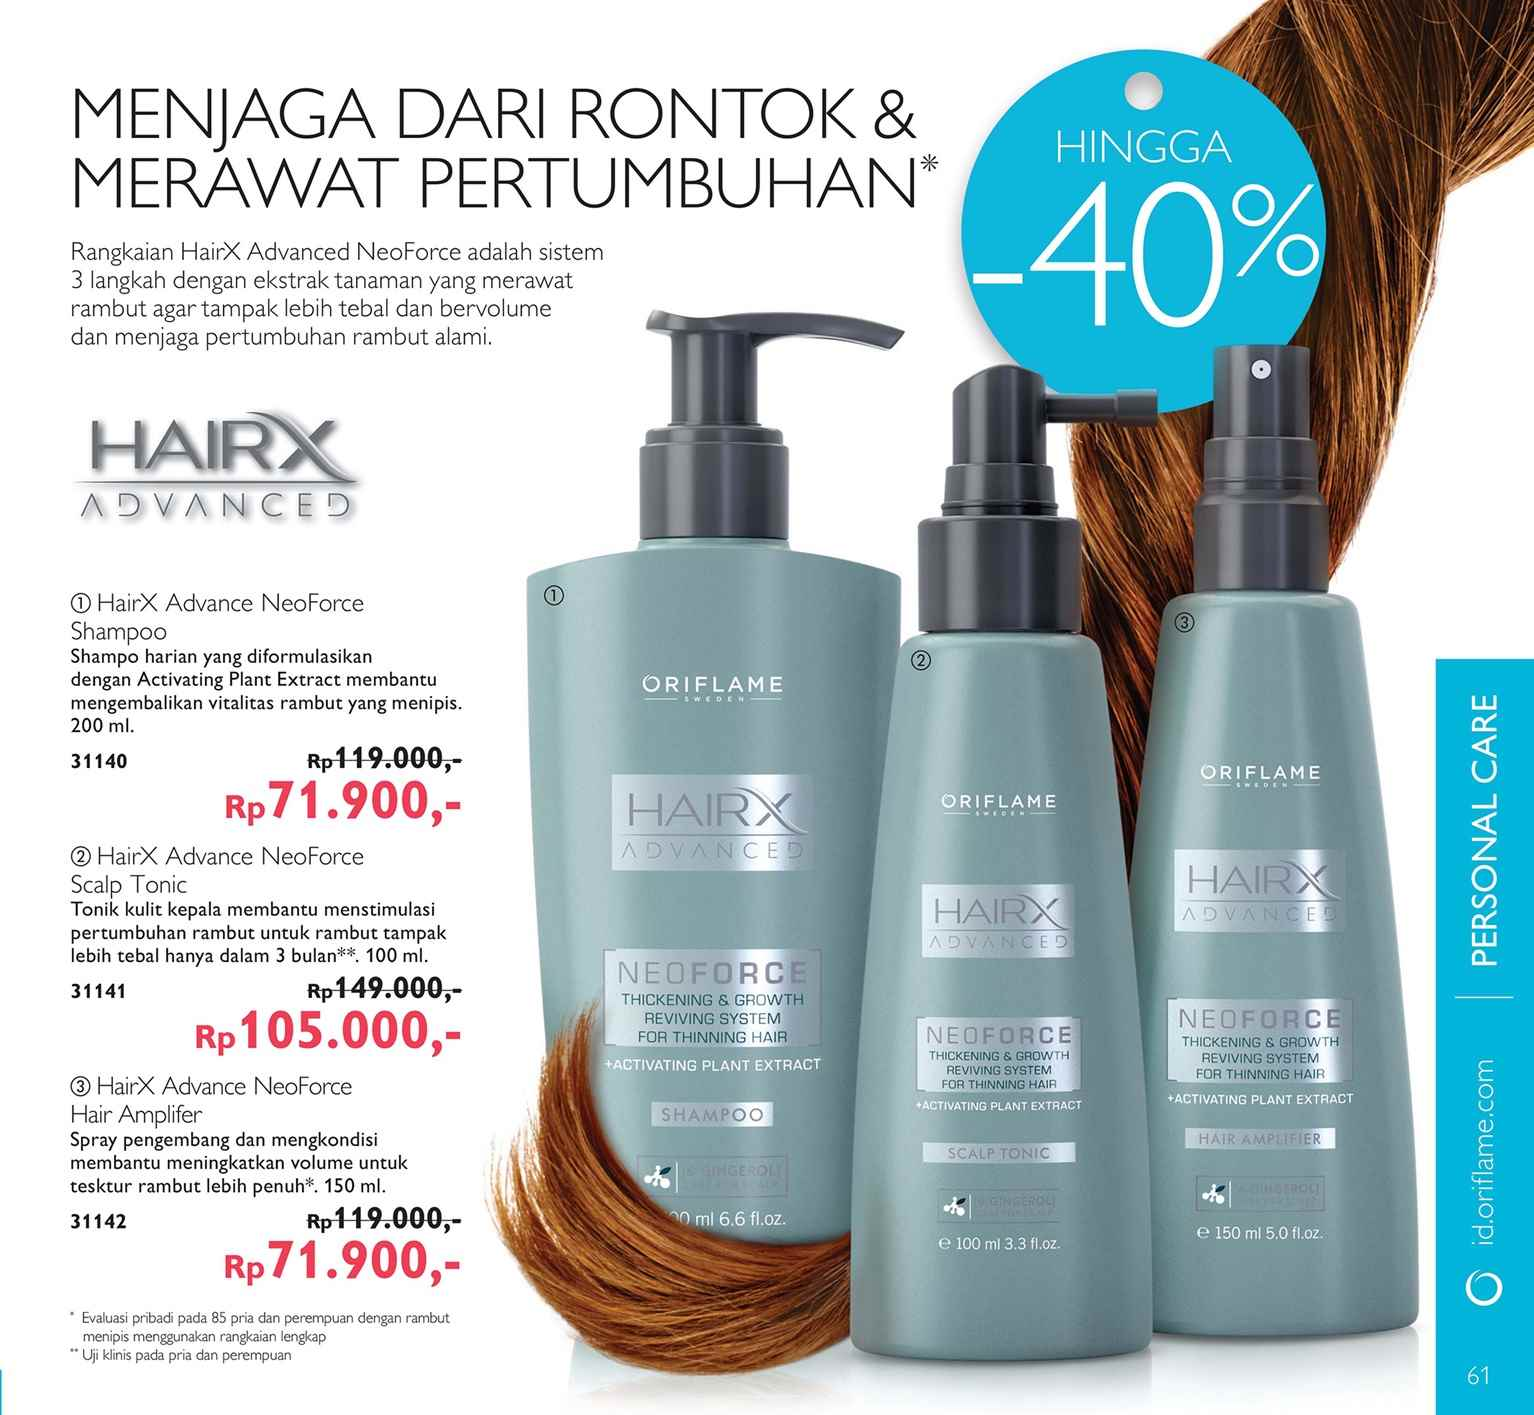 deea spa amp beauty perawatan rambut rontok